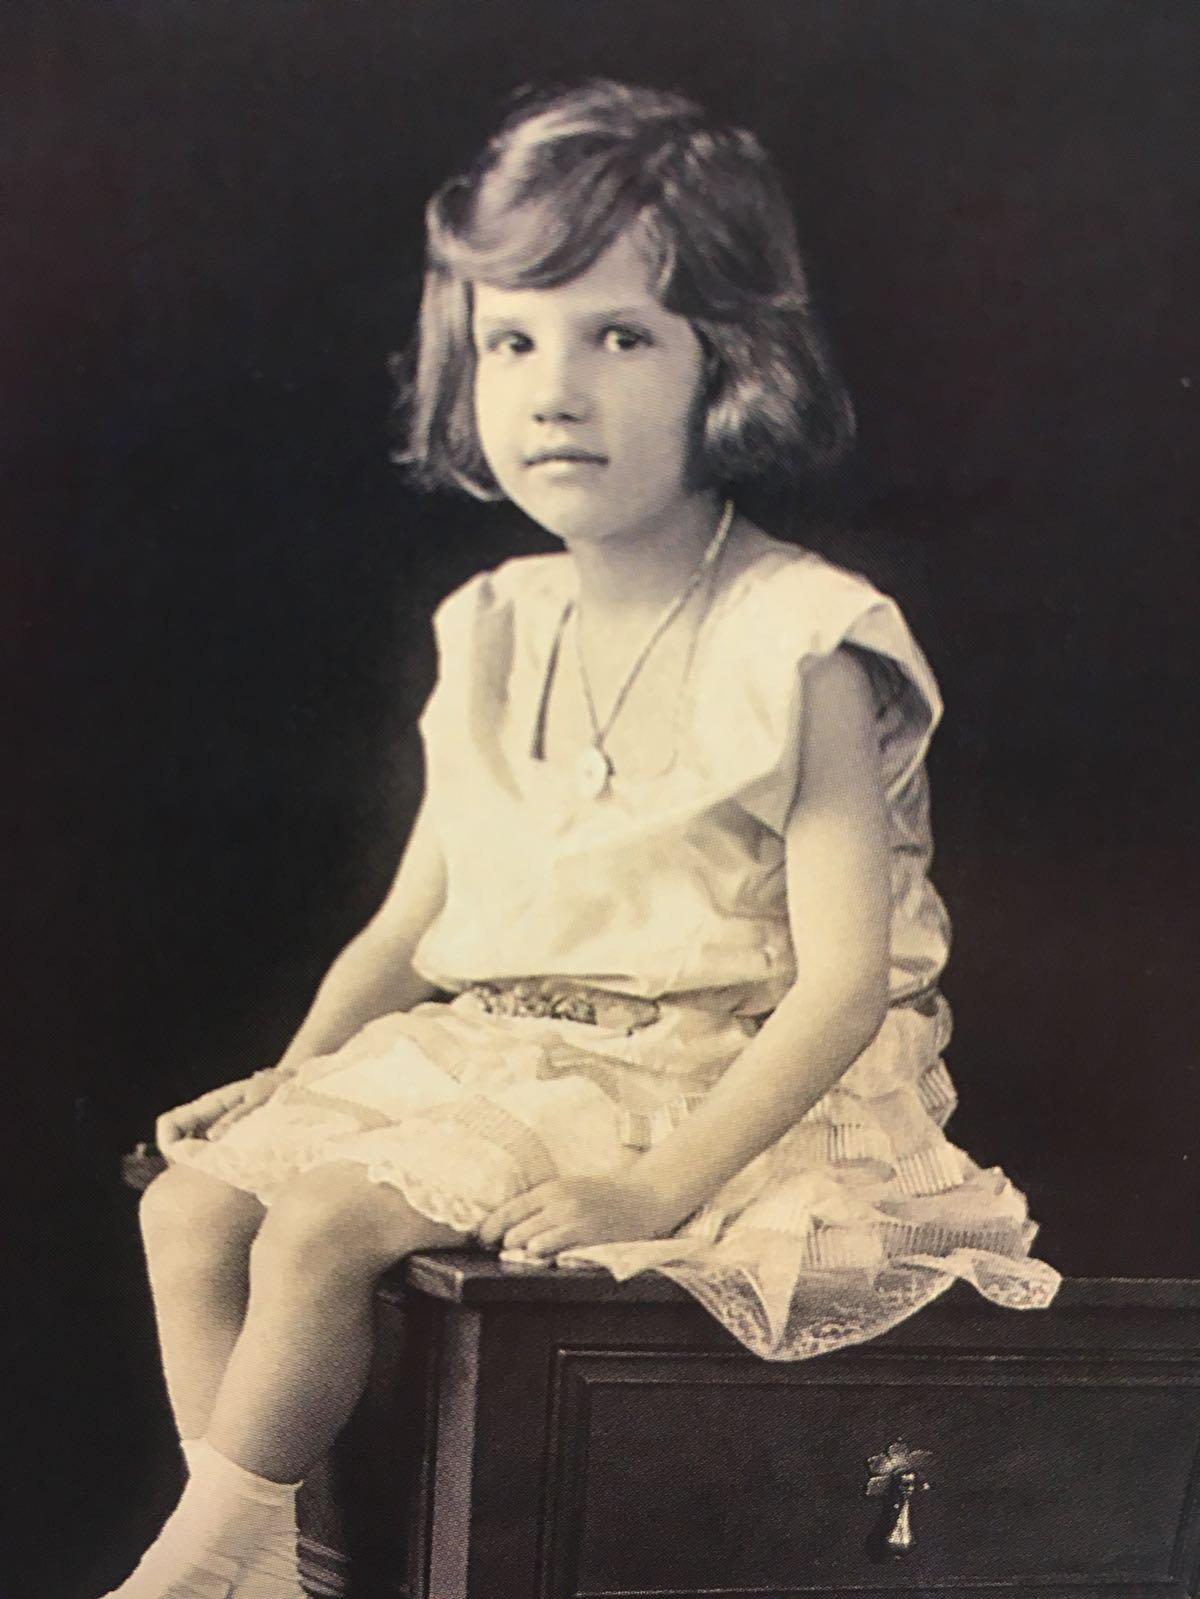 La princesa Ekaterina Románova en su infancia en Serbia